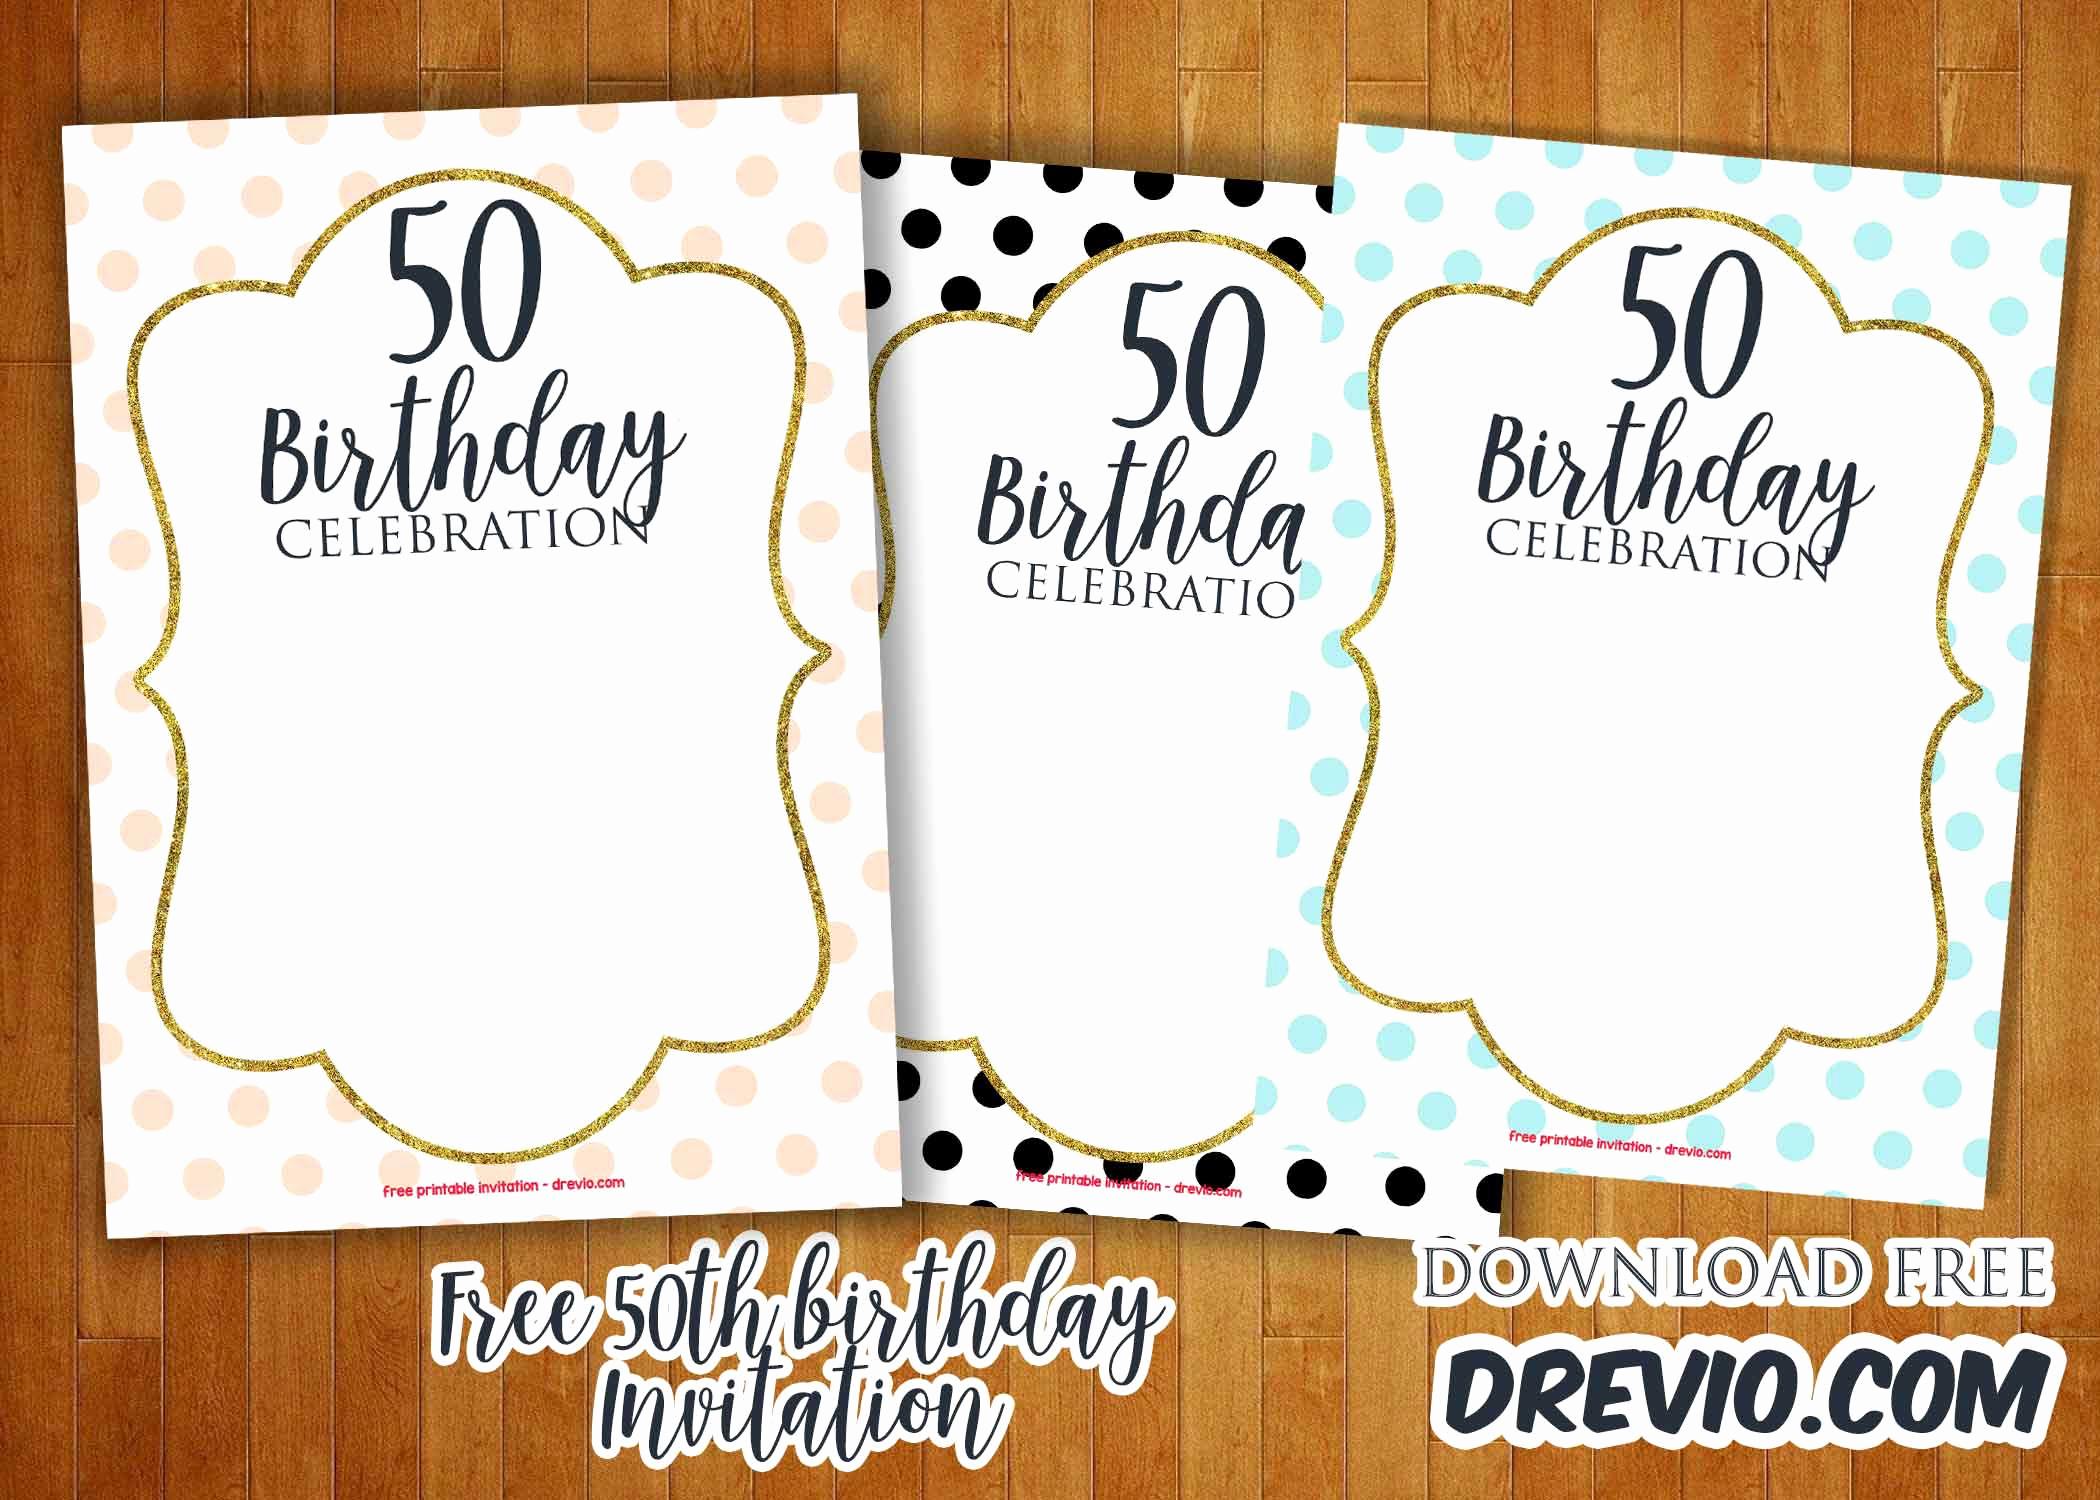 50th Birthday Invitation Template Luxury 50th Birthday Invitations Line